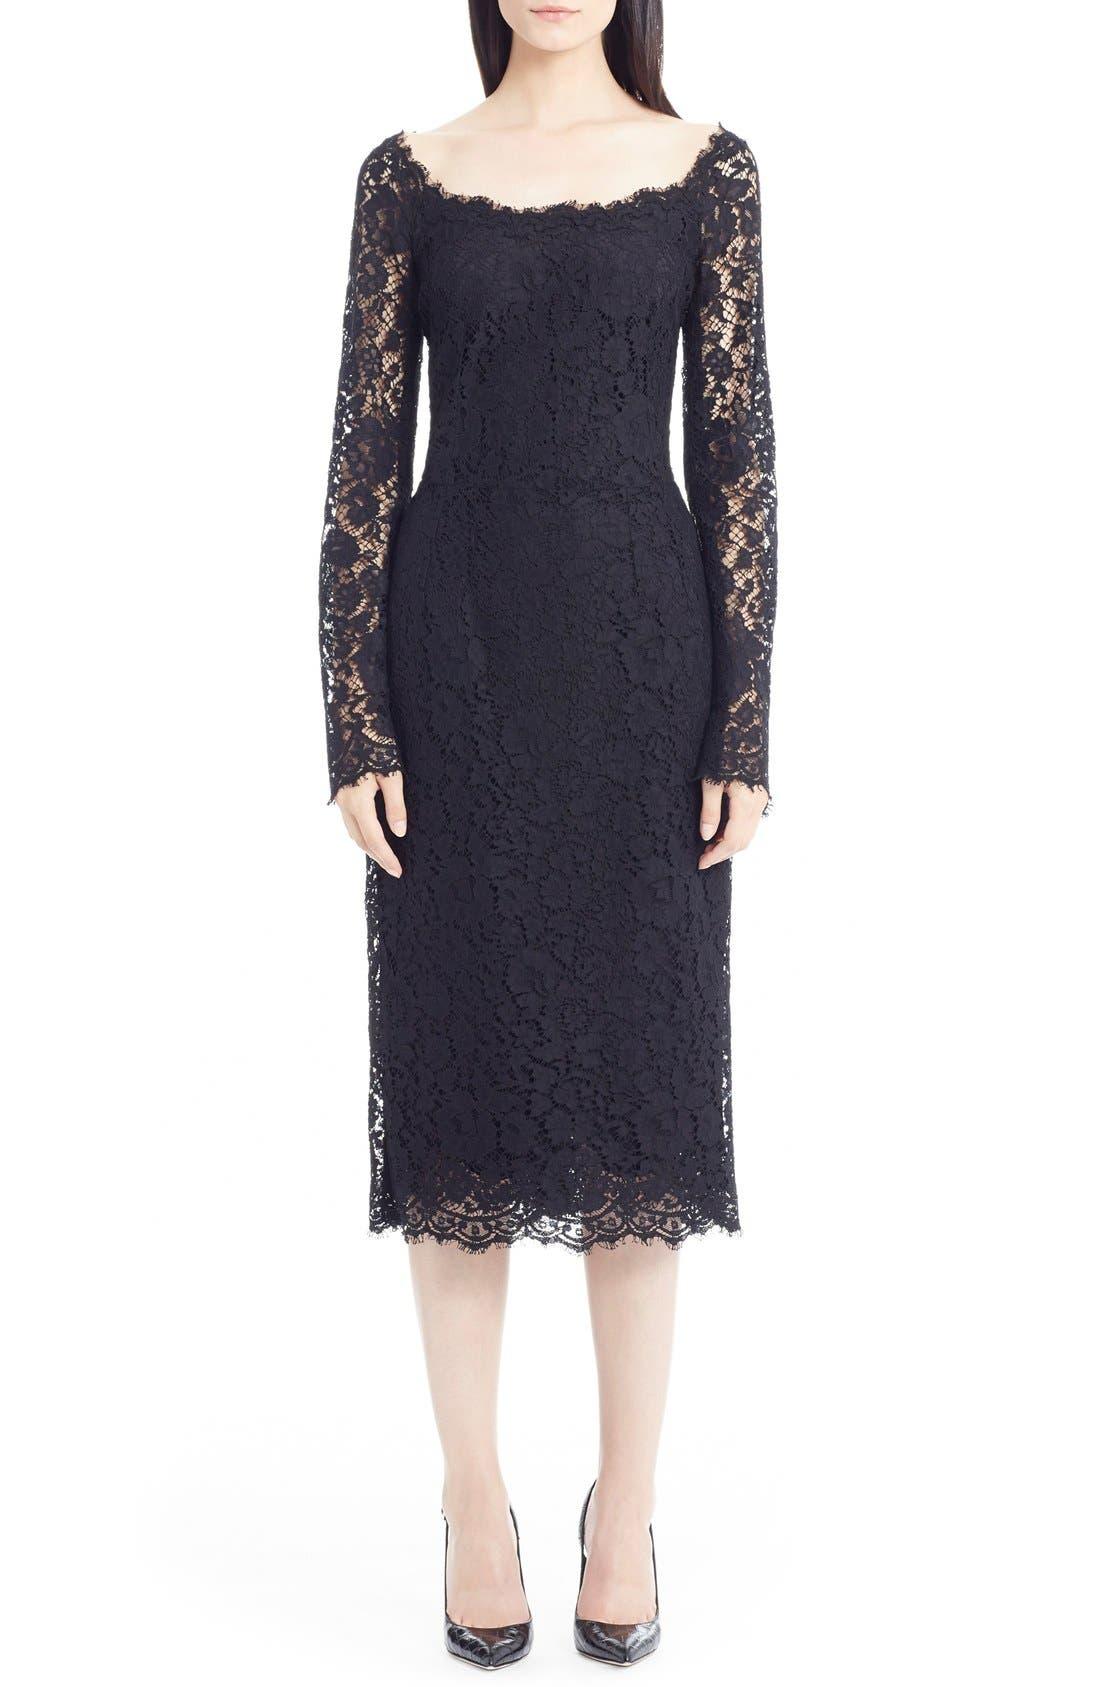 Alternate Image 1 Selected - Dolce&Gabbana Scoop Neck Lace Dress